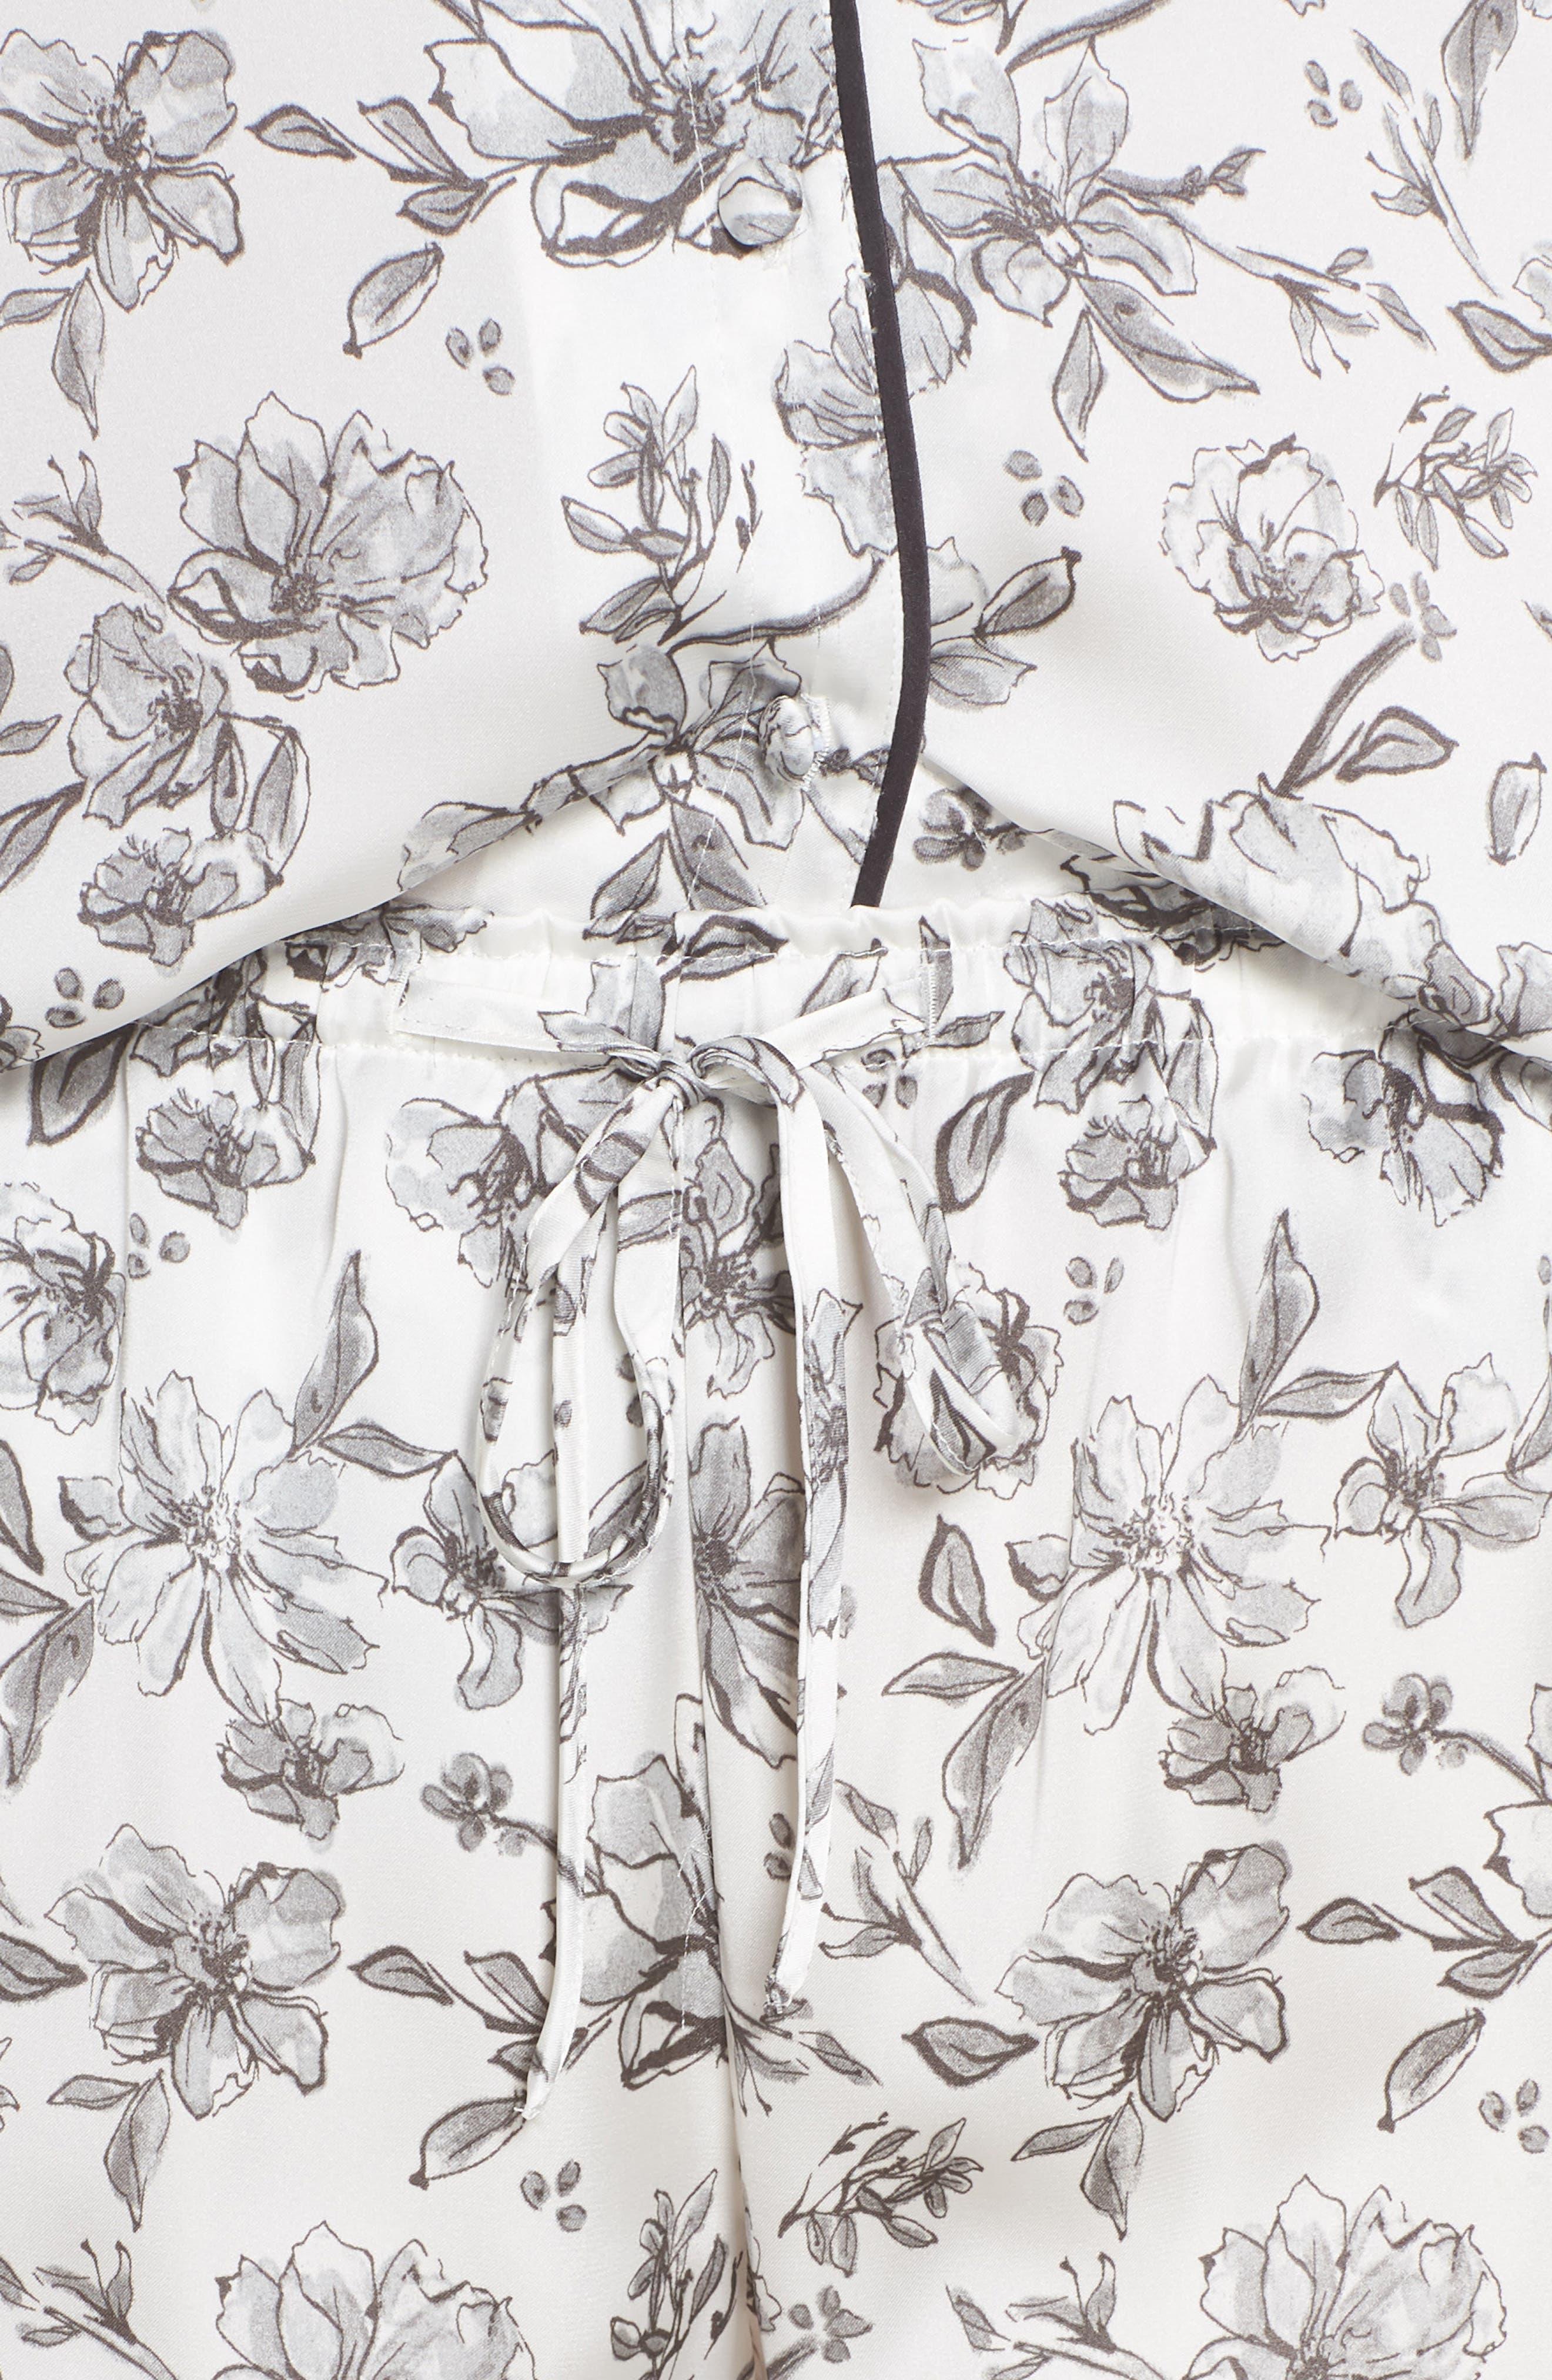 Satin Pajamas,                             Alternate thumbnail 4, color,                             IVORY EGRET LOVELY FLORAL